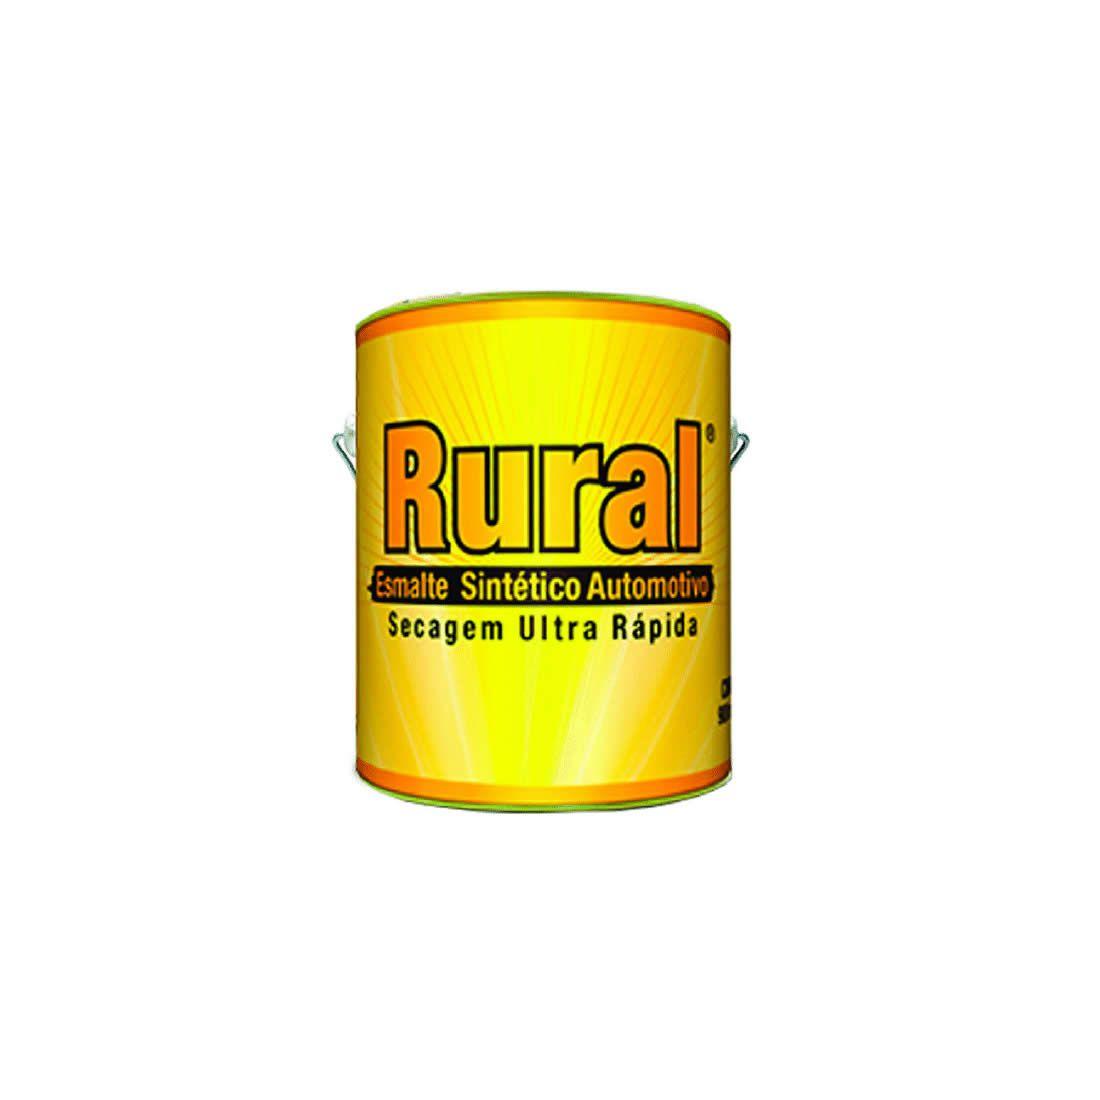 Esmalte Sintético Rural Secagem Ultra Rápido Aluminio P/Rodas 3,6Lt